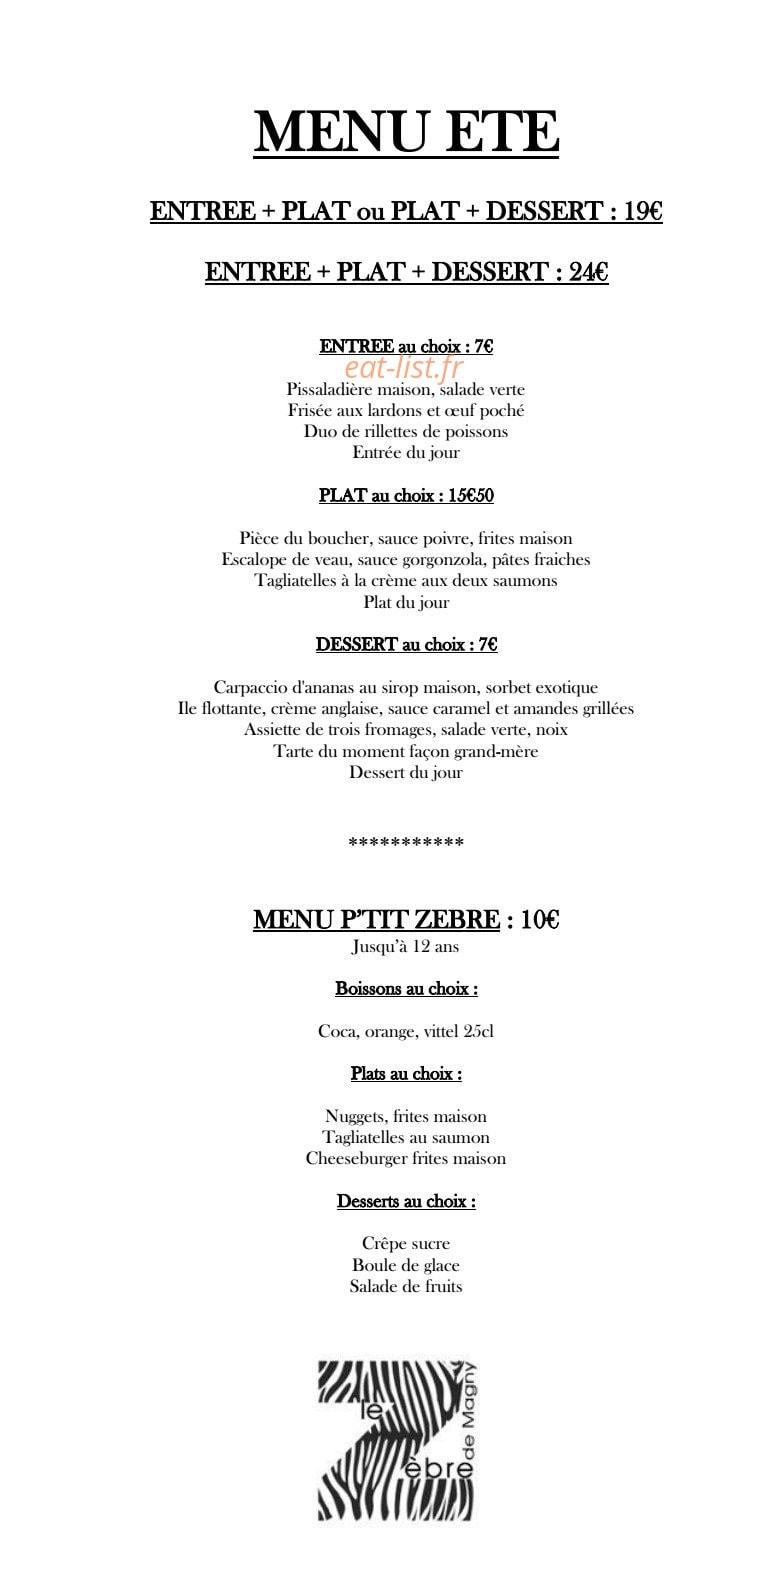 Magny Le Hongre Restaurant le zèbre de magny à magny le hongre, carte-menu et photos